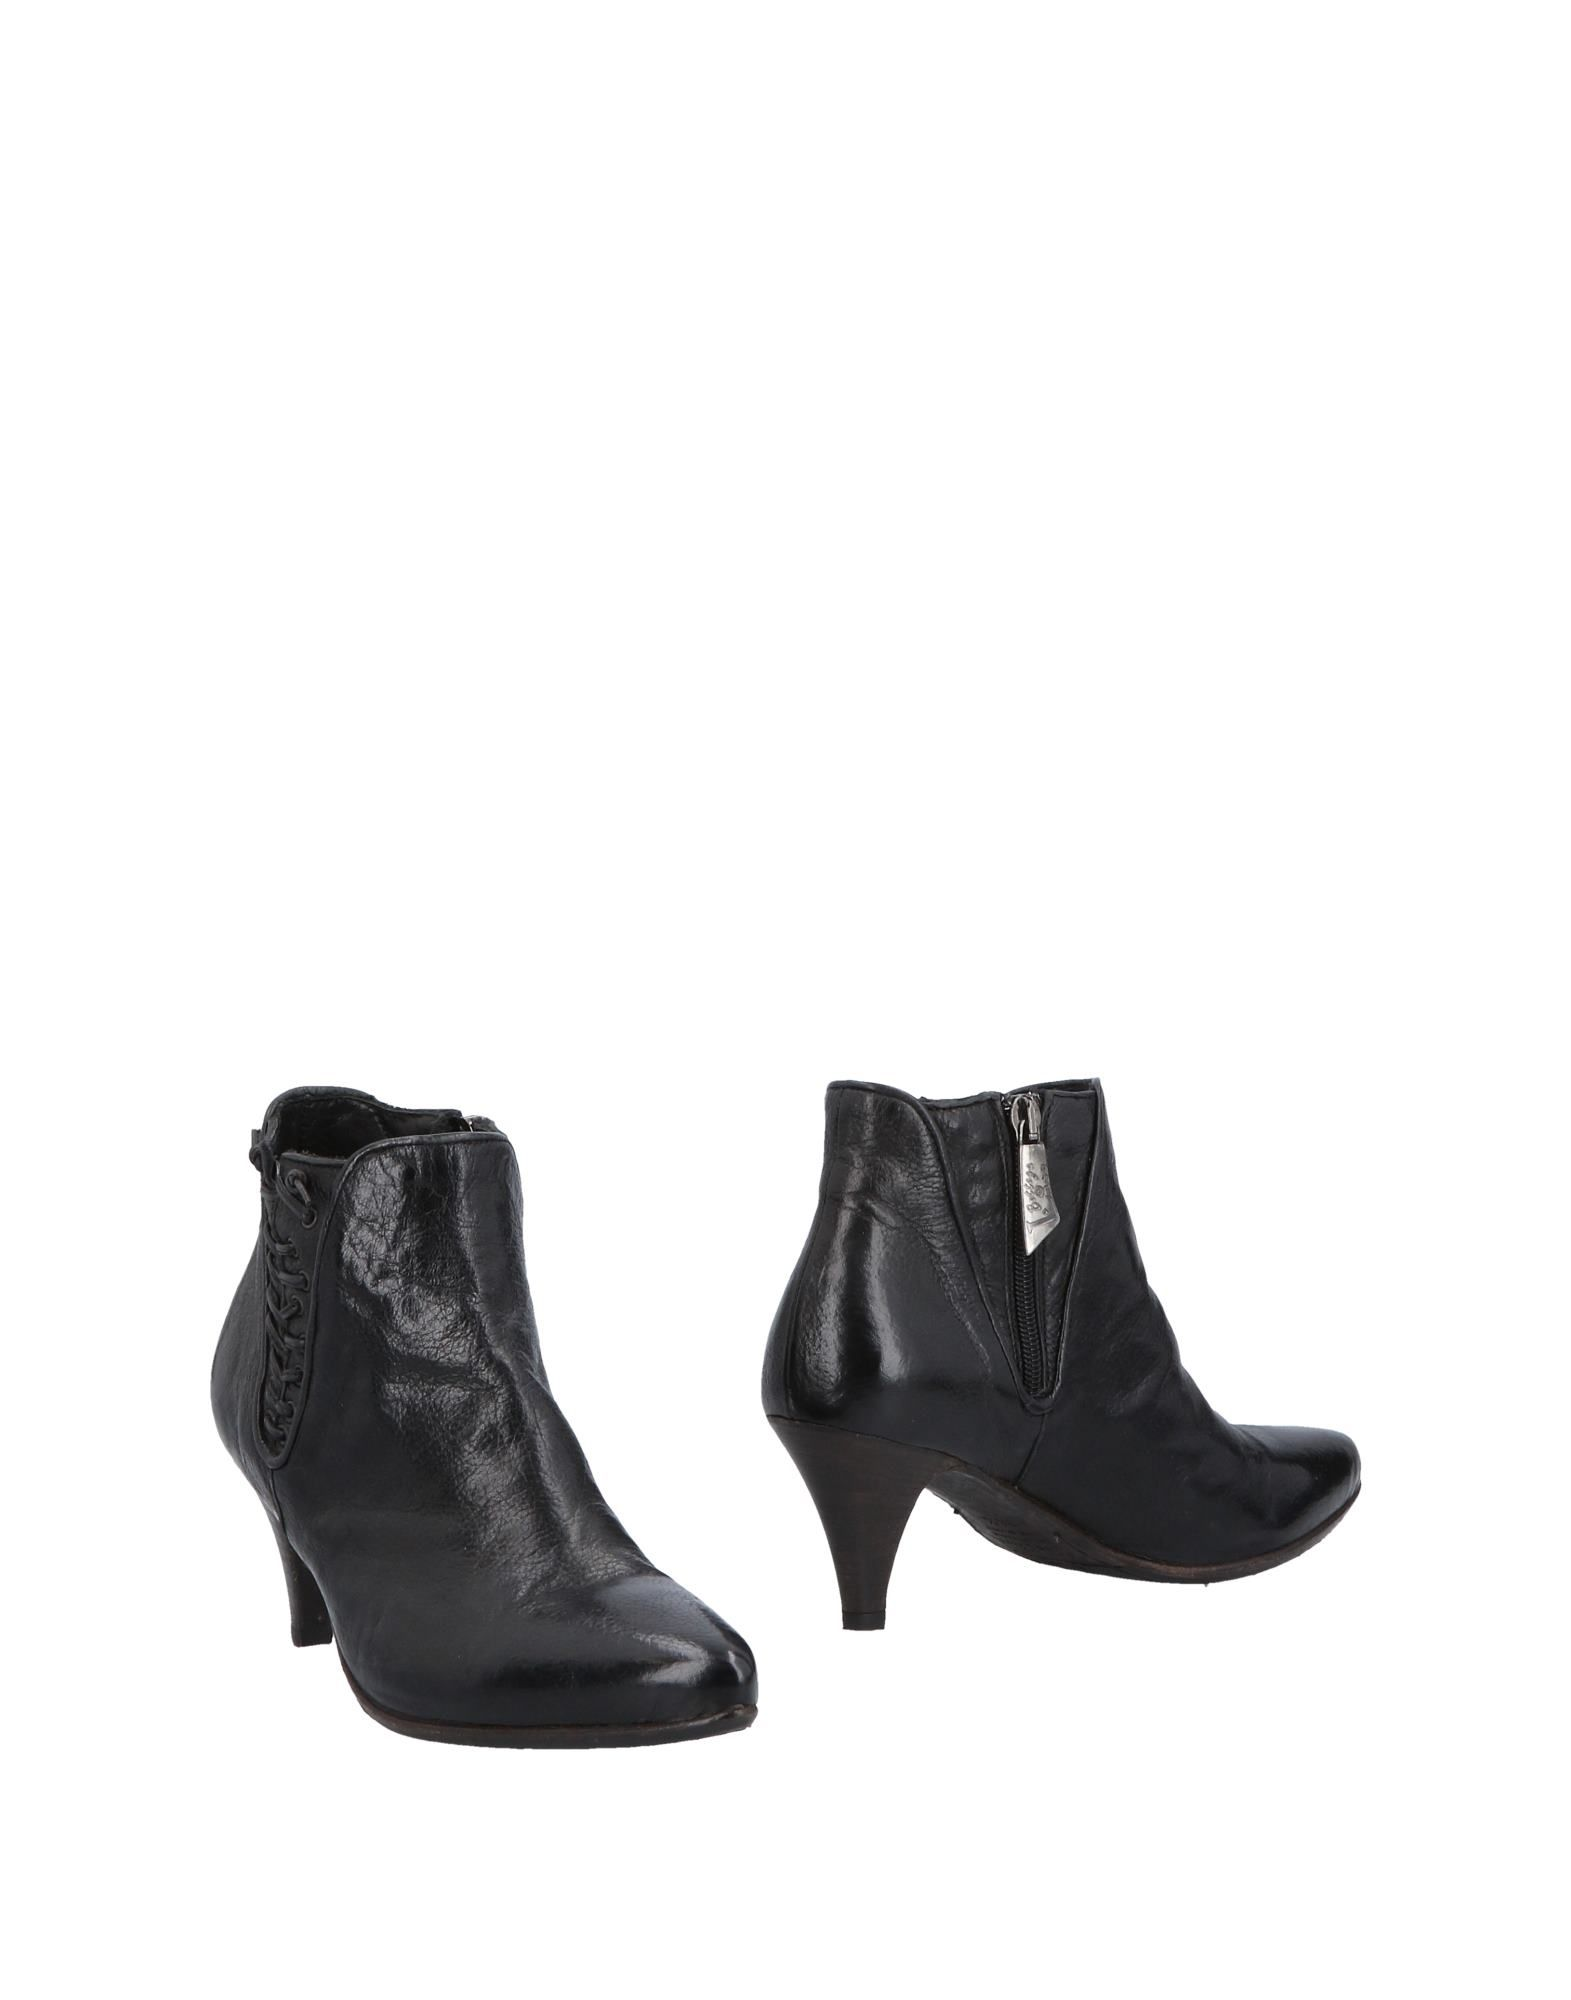 La Bottega Di Lisa Stiefelette Damen  11501572BUGut aussehende strapazierfähige Schuhe